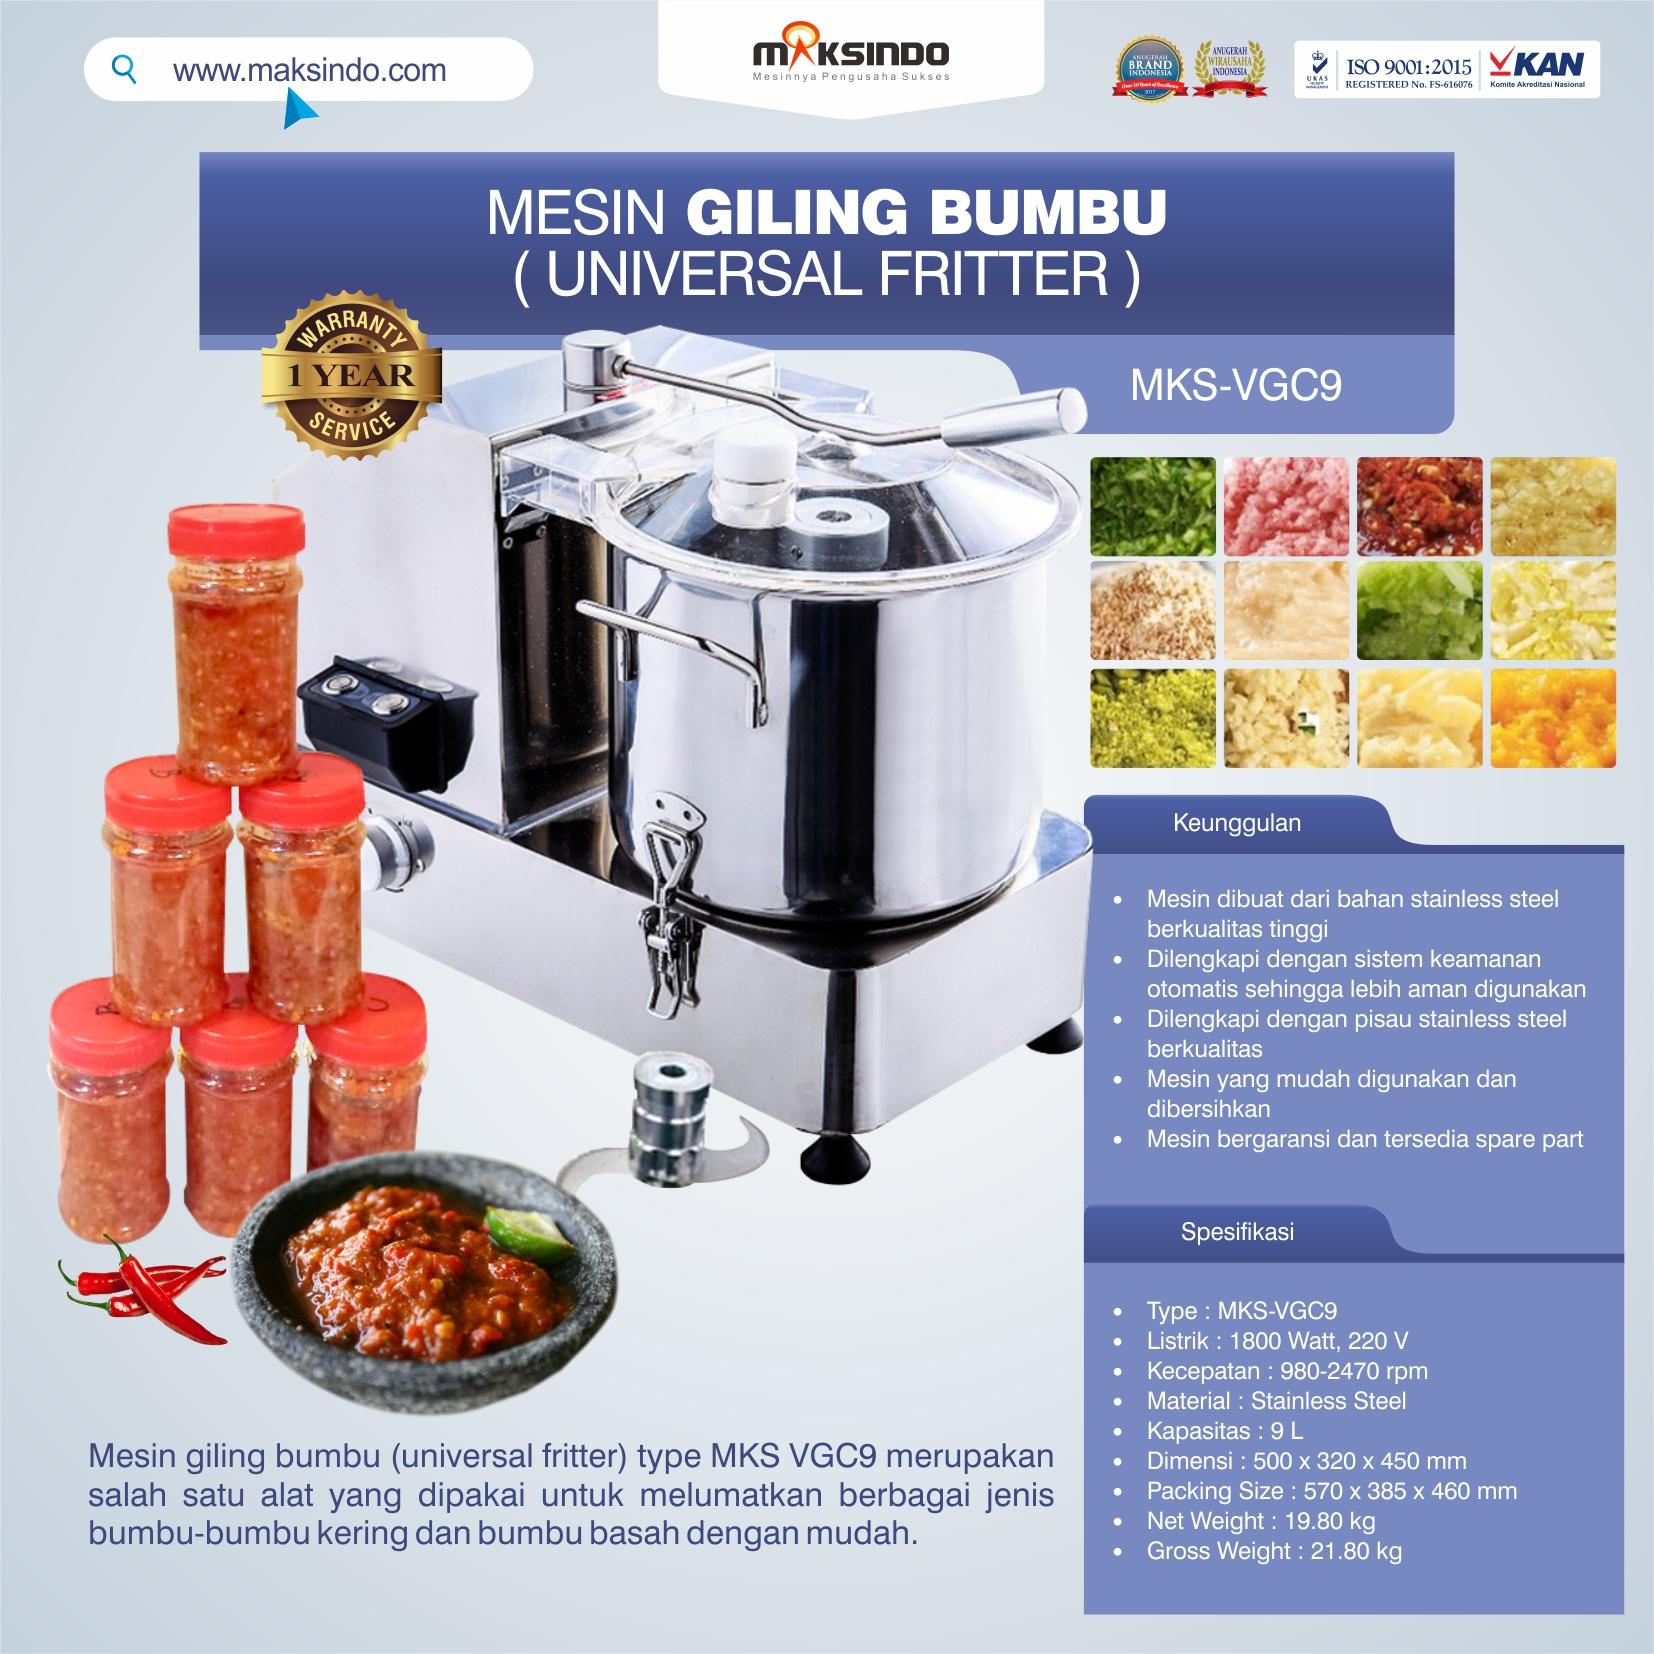 Jual Mesin Giling Bumbu (Universal Fritter) MKS VGC9 di Bandung